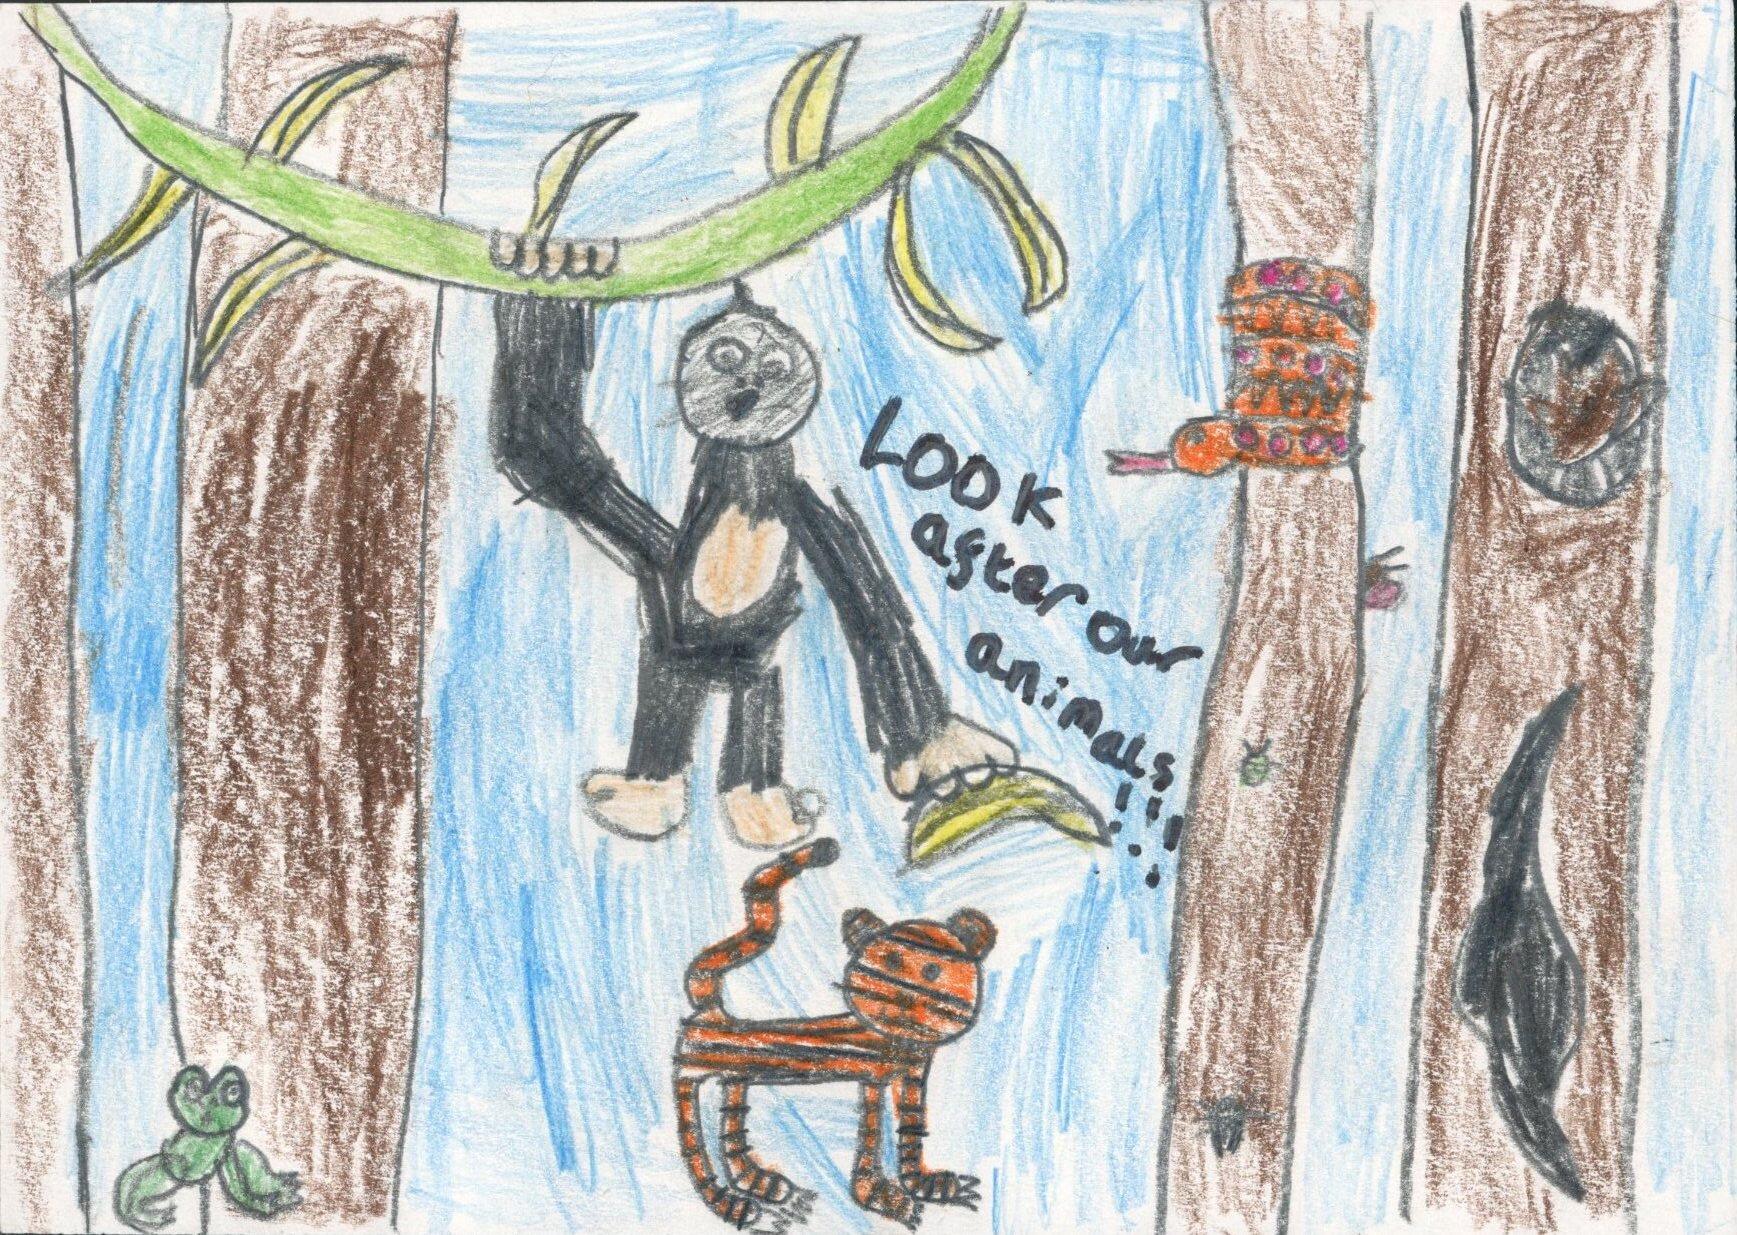 Prize Winner  Best Visual Message, Joni aged 7